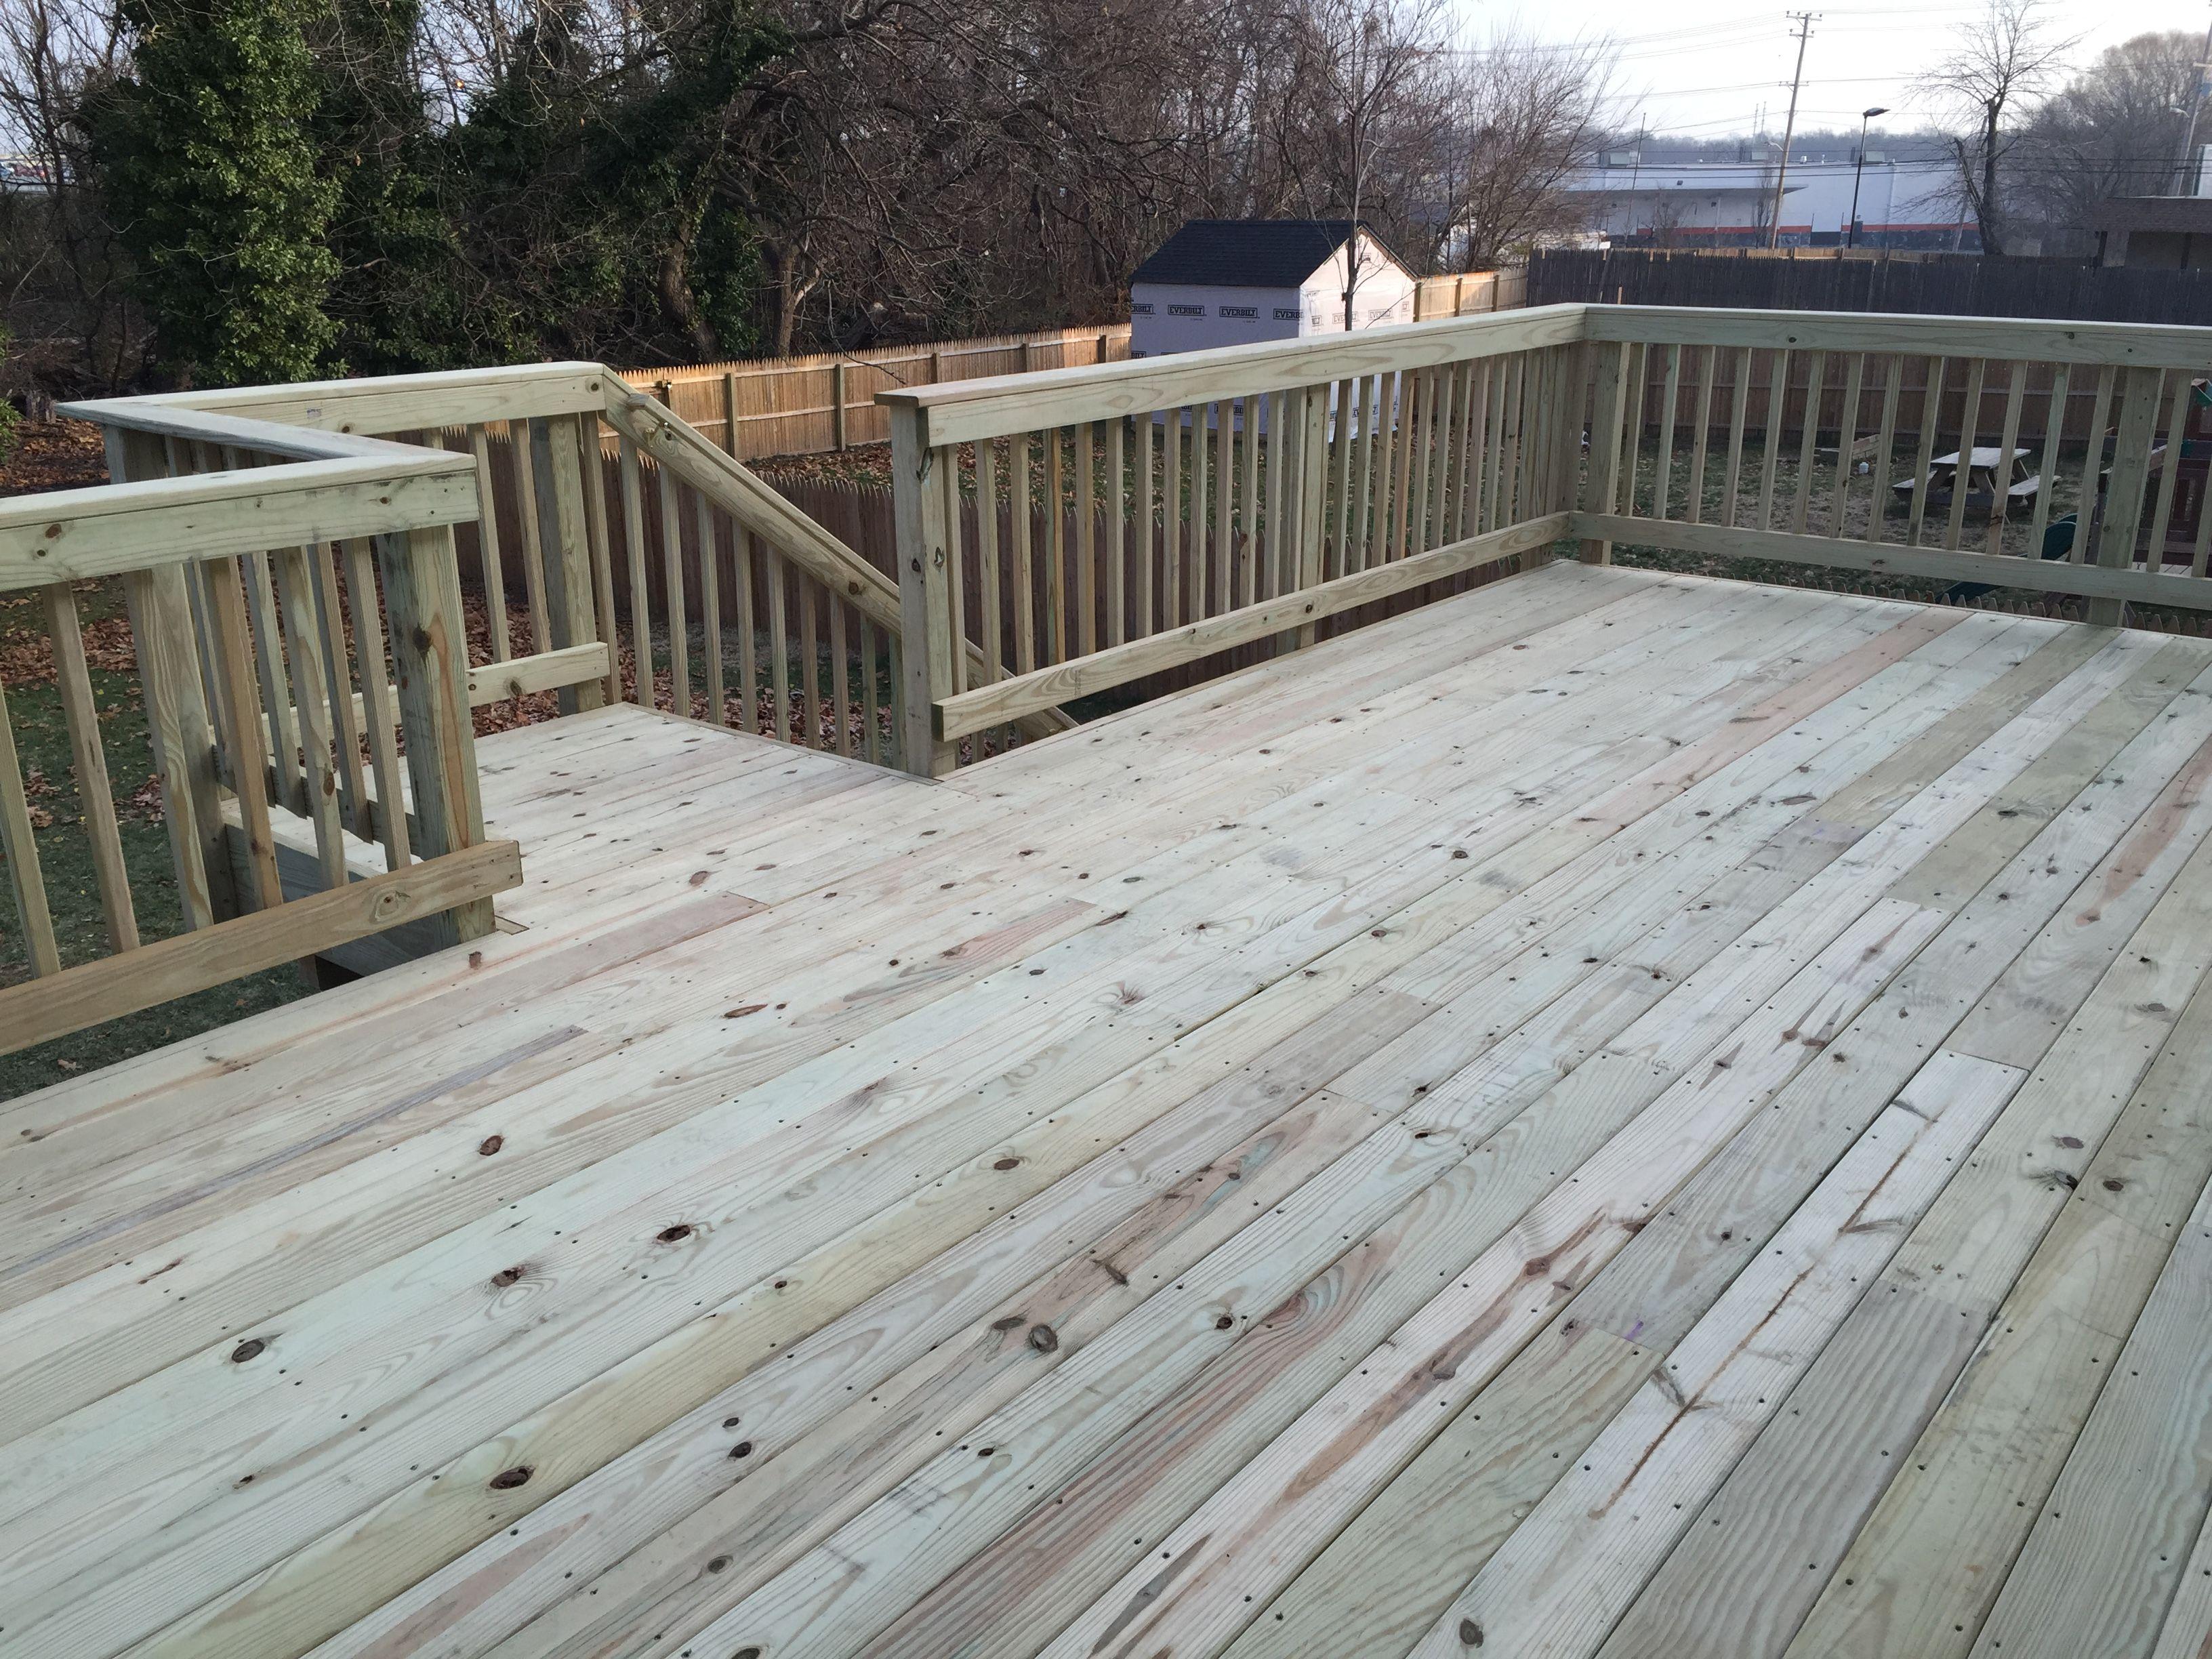 Standard 5 4 Pressure Treated Deck W Wood Wrap Wood Handrail | Pressure Treated Wood Handrail | Menards | Deck Handrail | Cedartone Premium | Treated Pine | Treated Deck Stairs